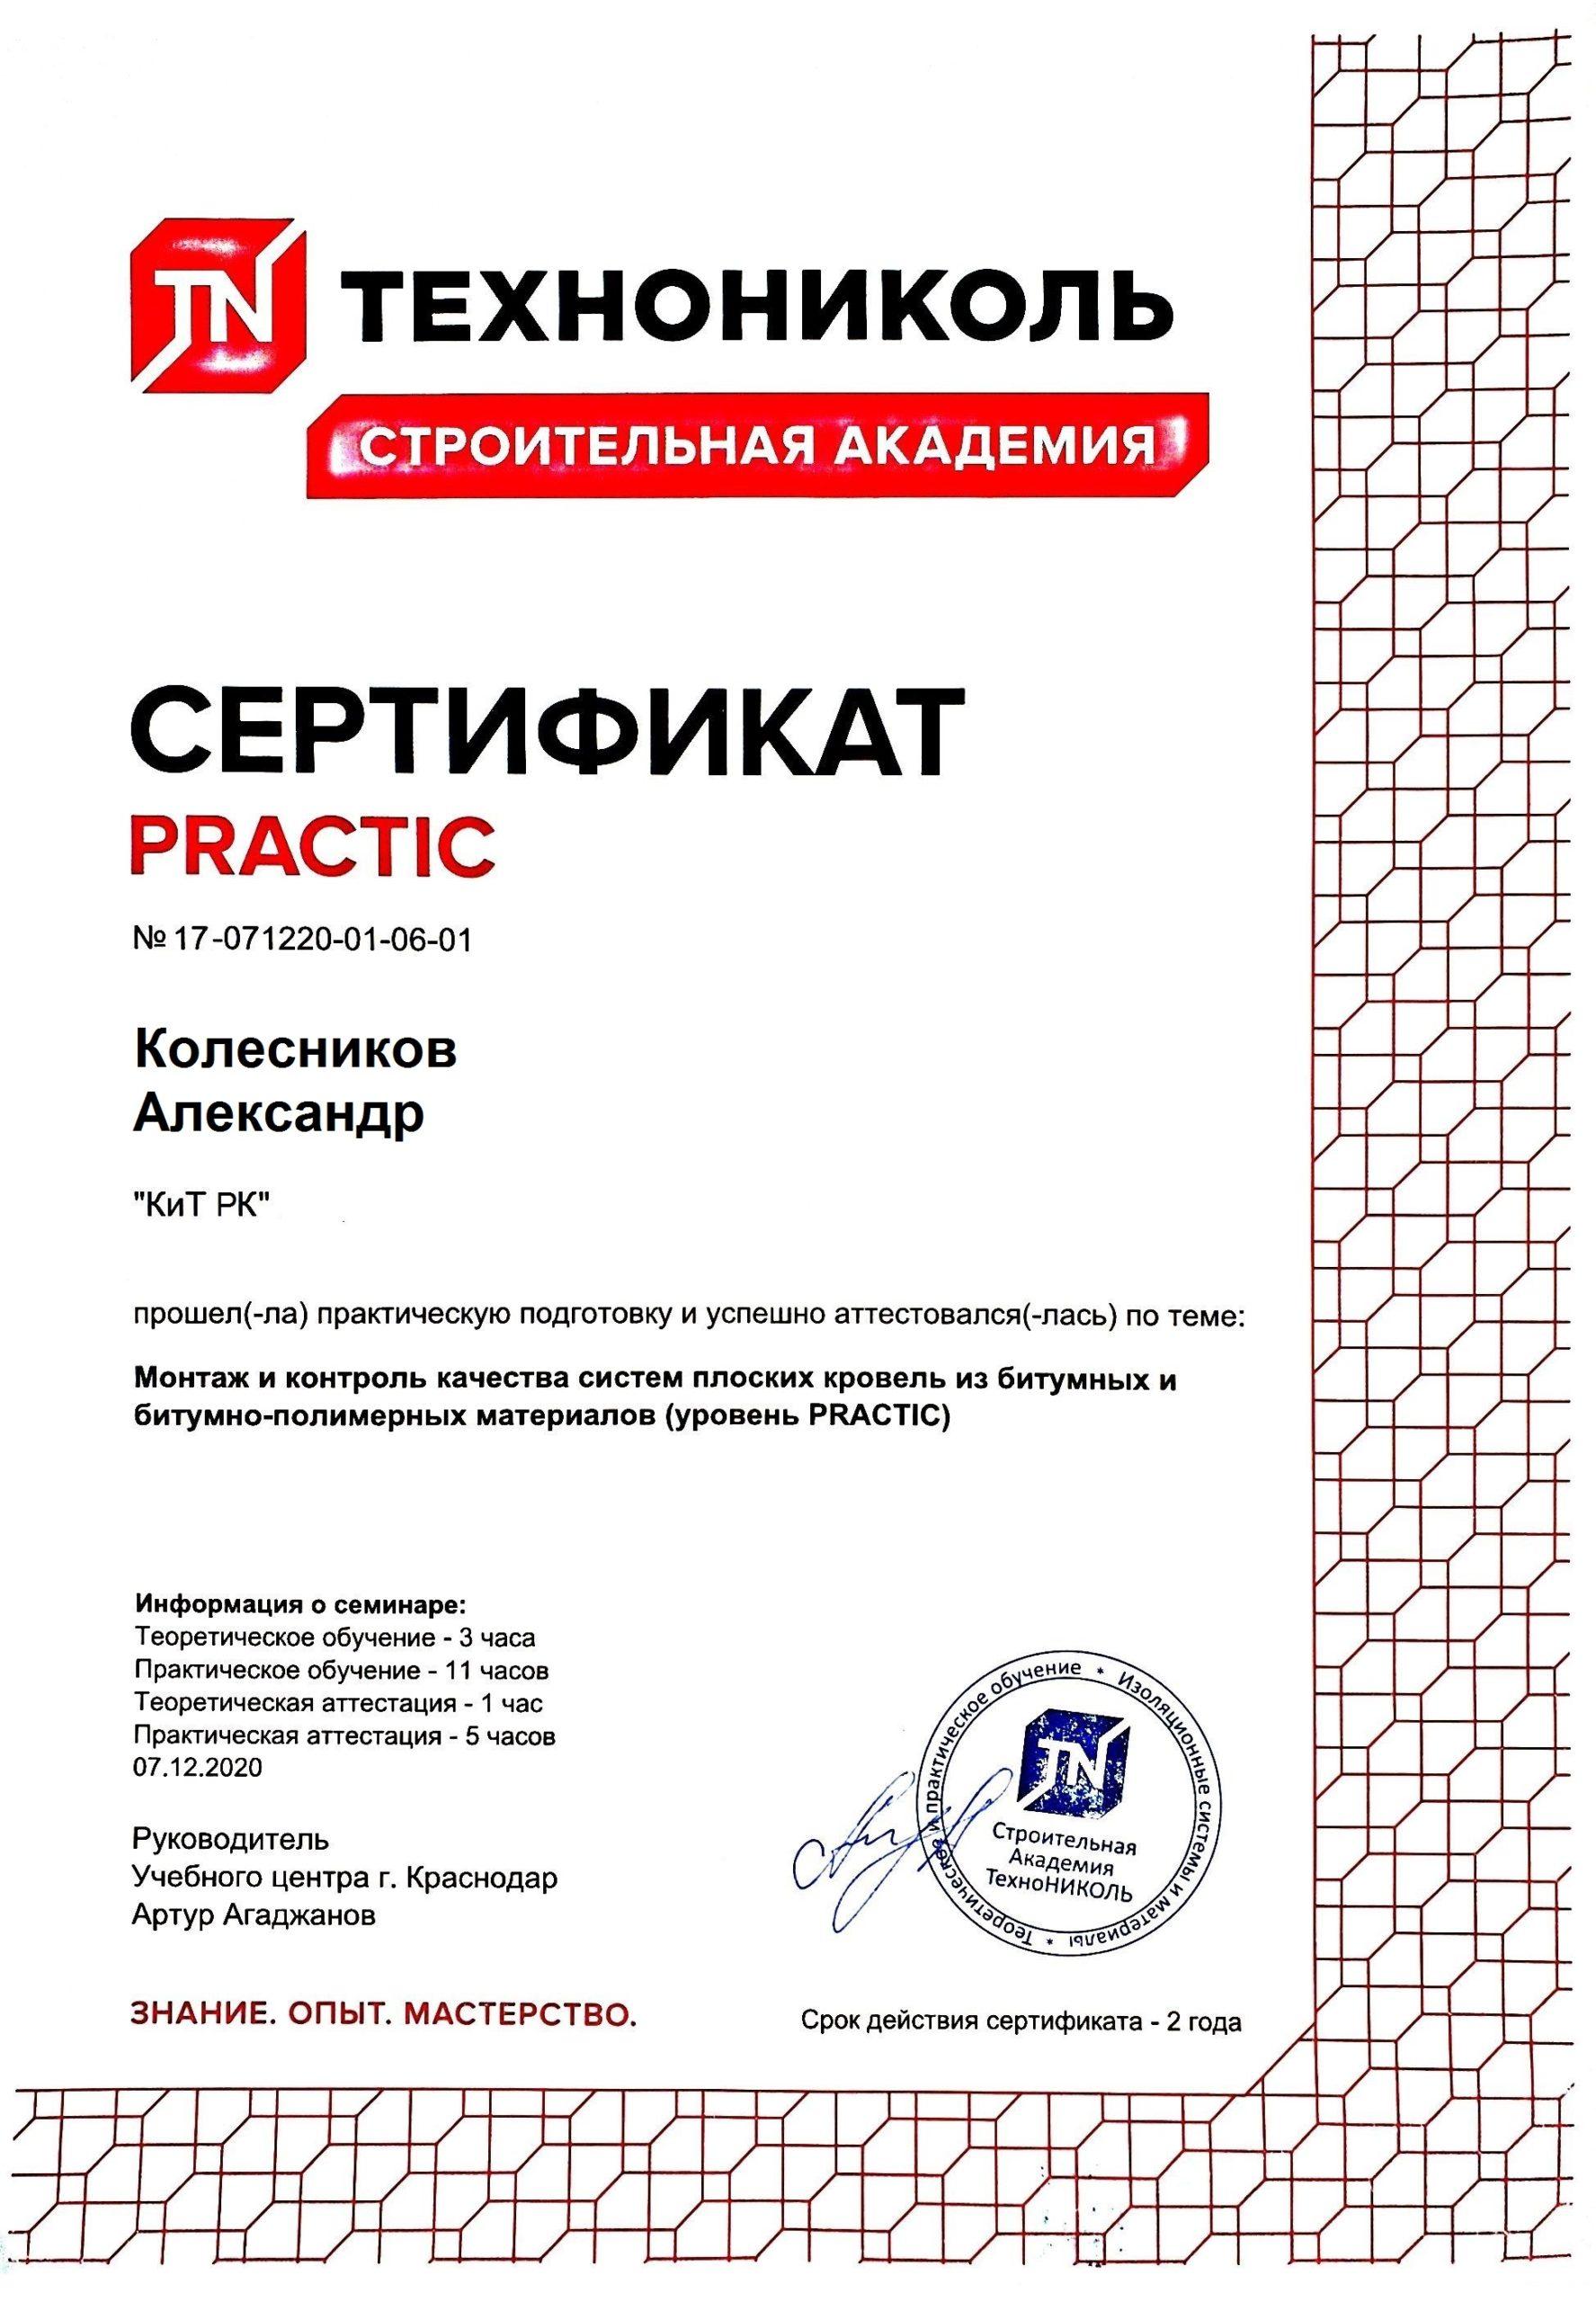 Сертификат саша